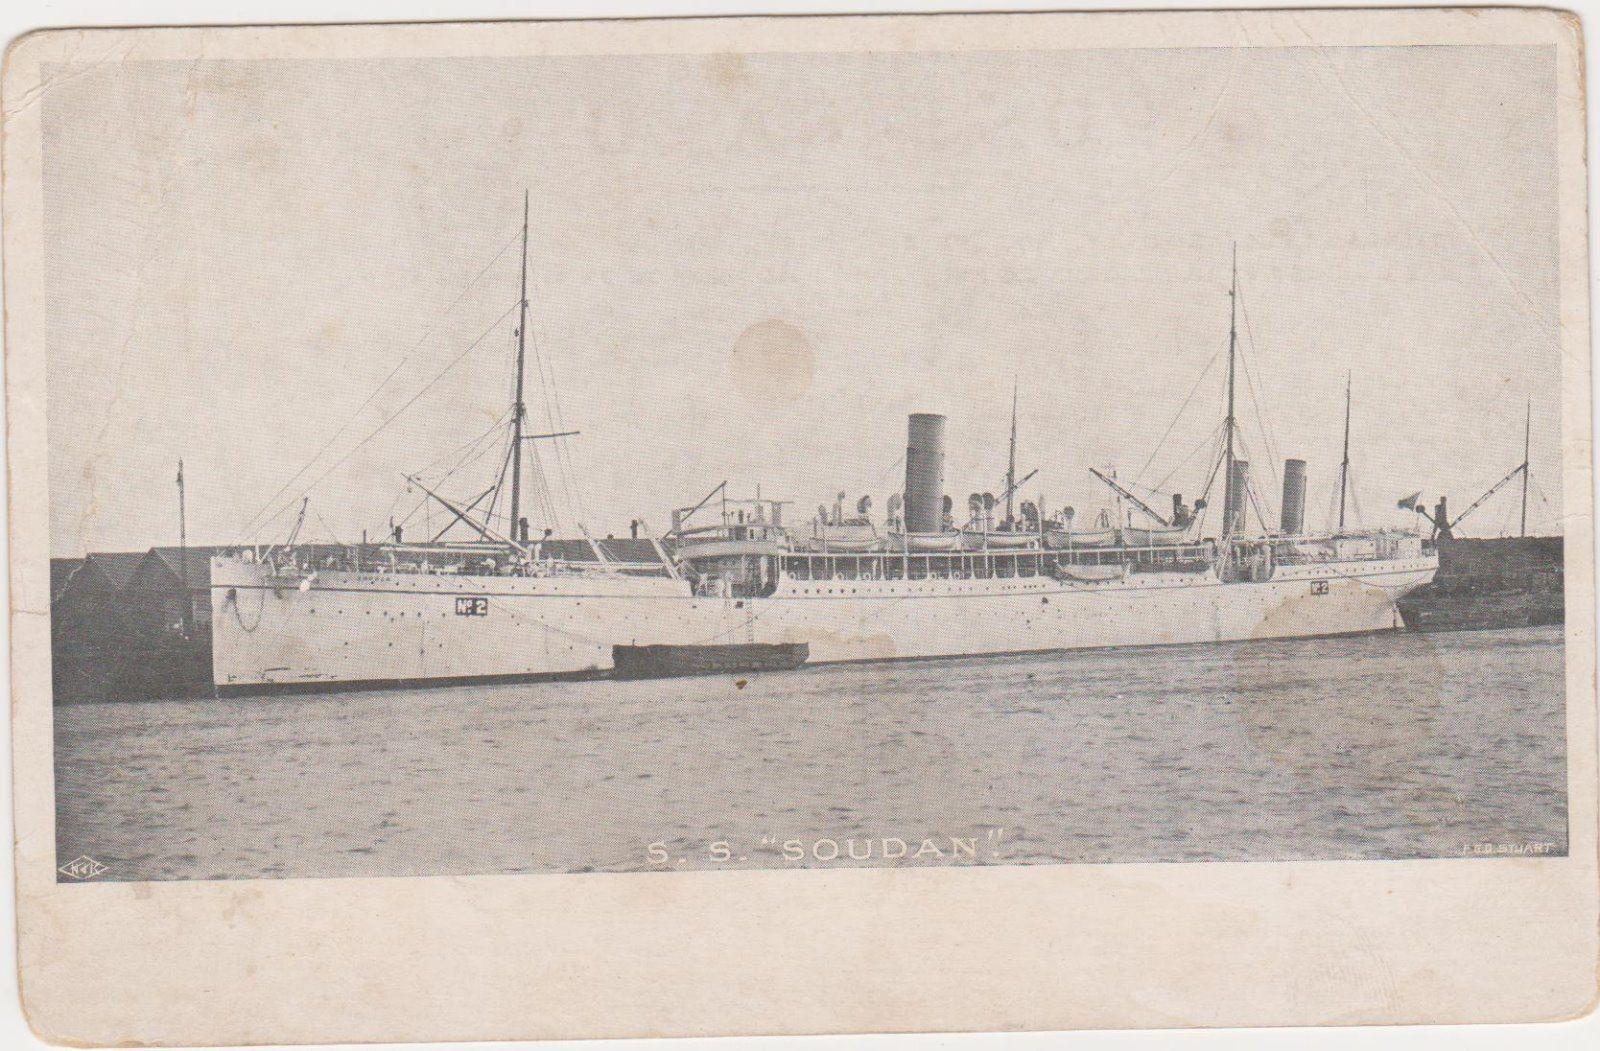 SS Soundan.jpg